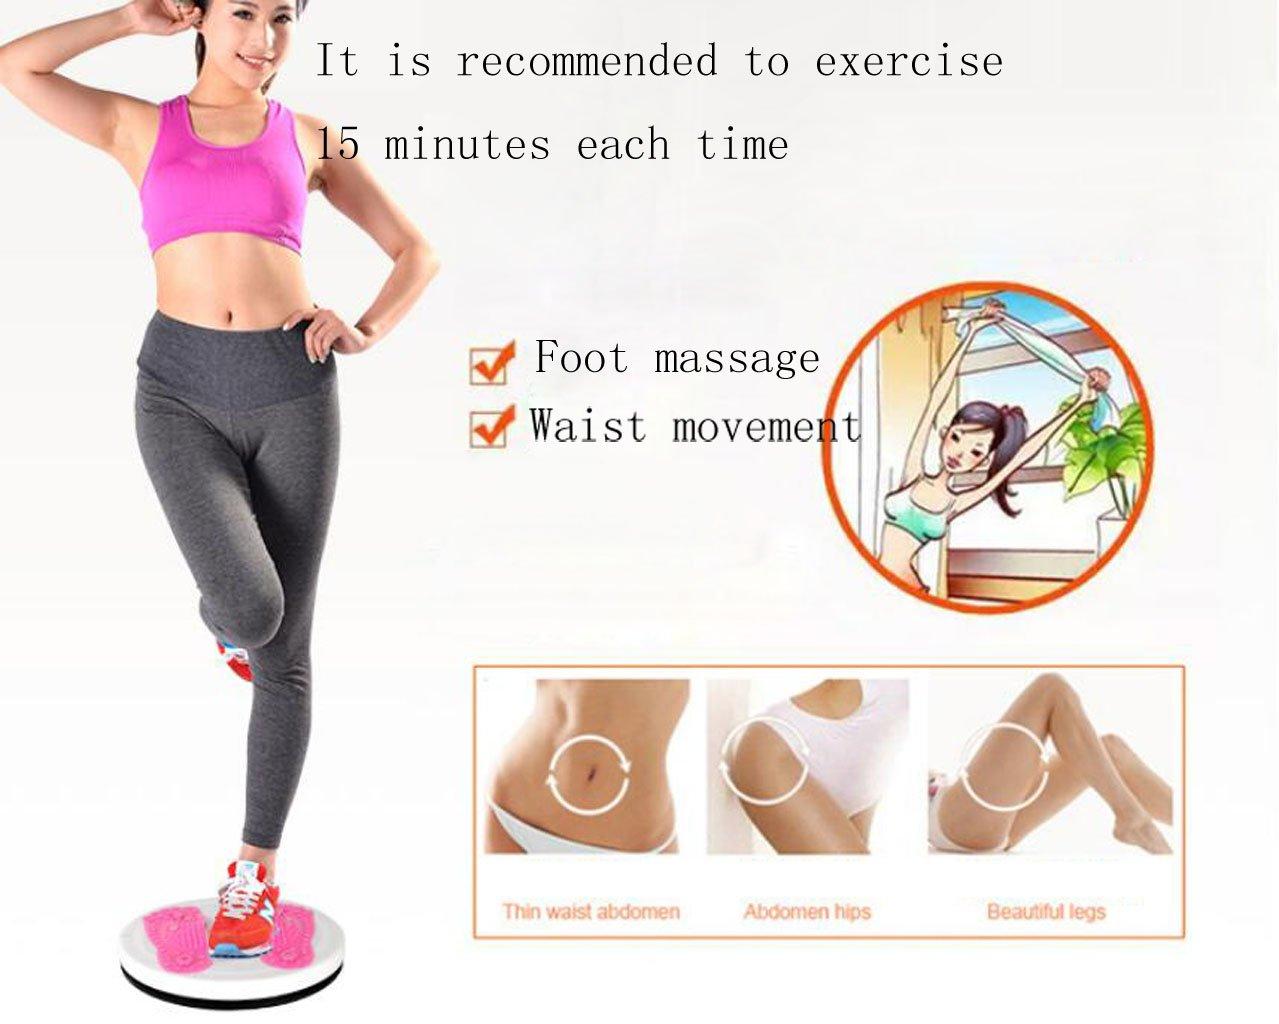 16589 Cintura Magnética Twister Fitness Equipment Indoor Sports Yoga ...